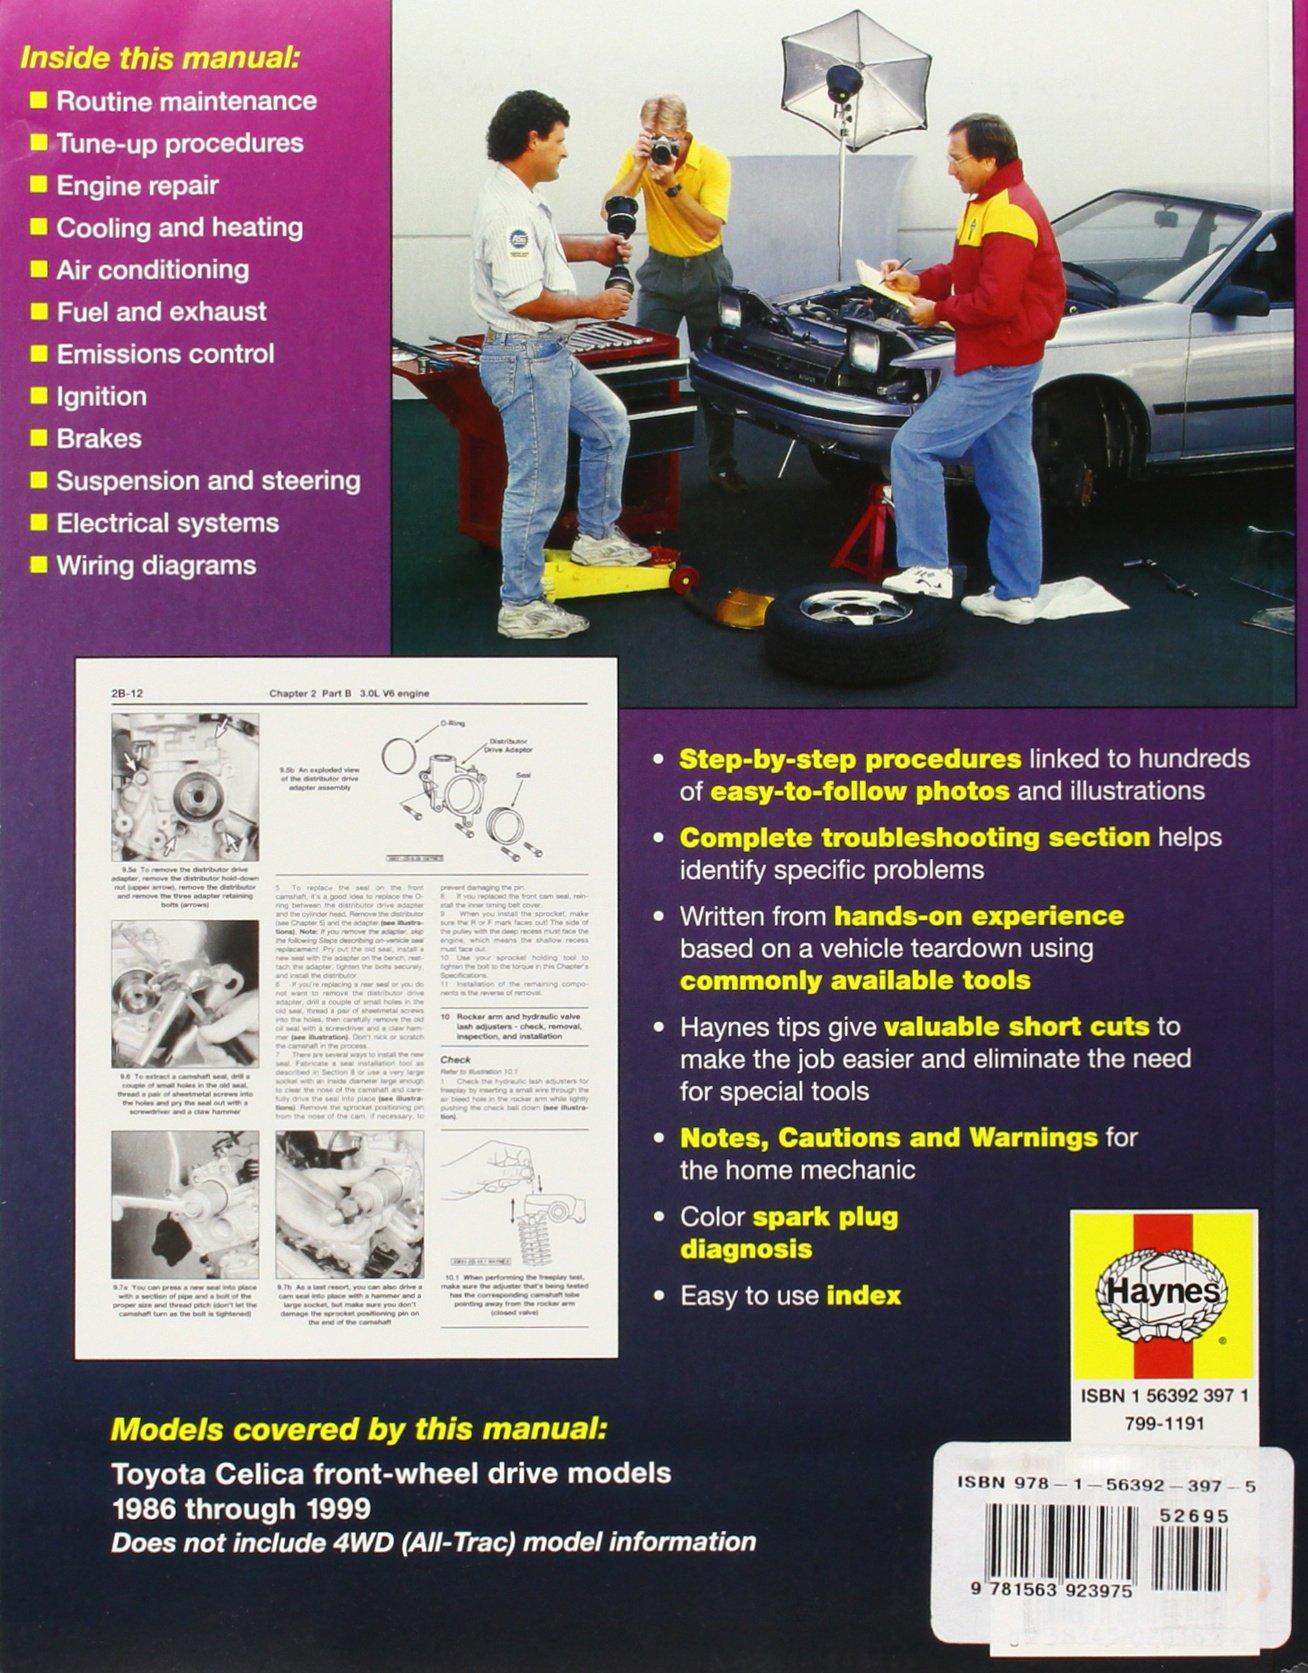 Toyota Celica Fwd 86 99 1986 1999 Haynes Automotive Repair Wiring Diagram Manuals Larry Warren J H 9781563923975 Books